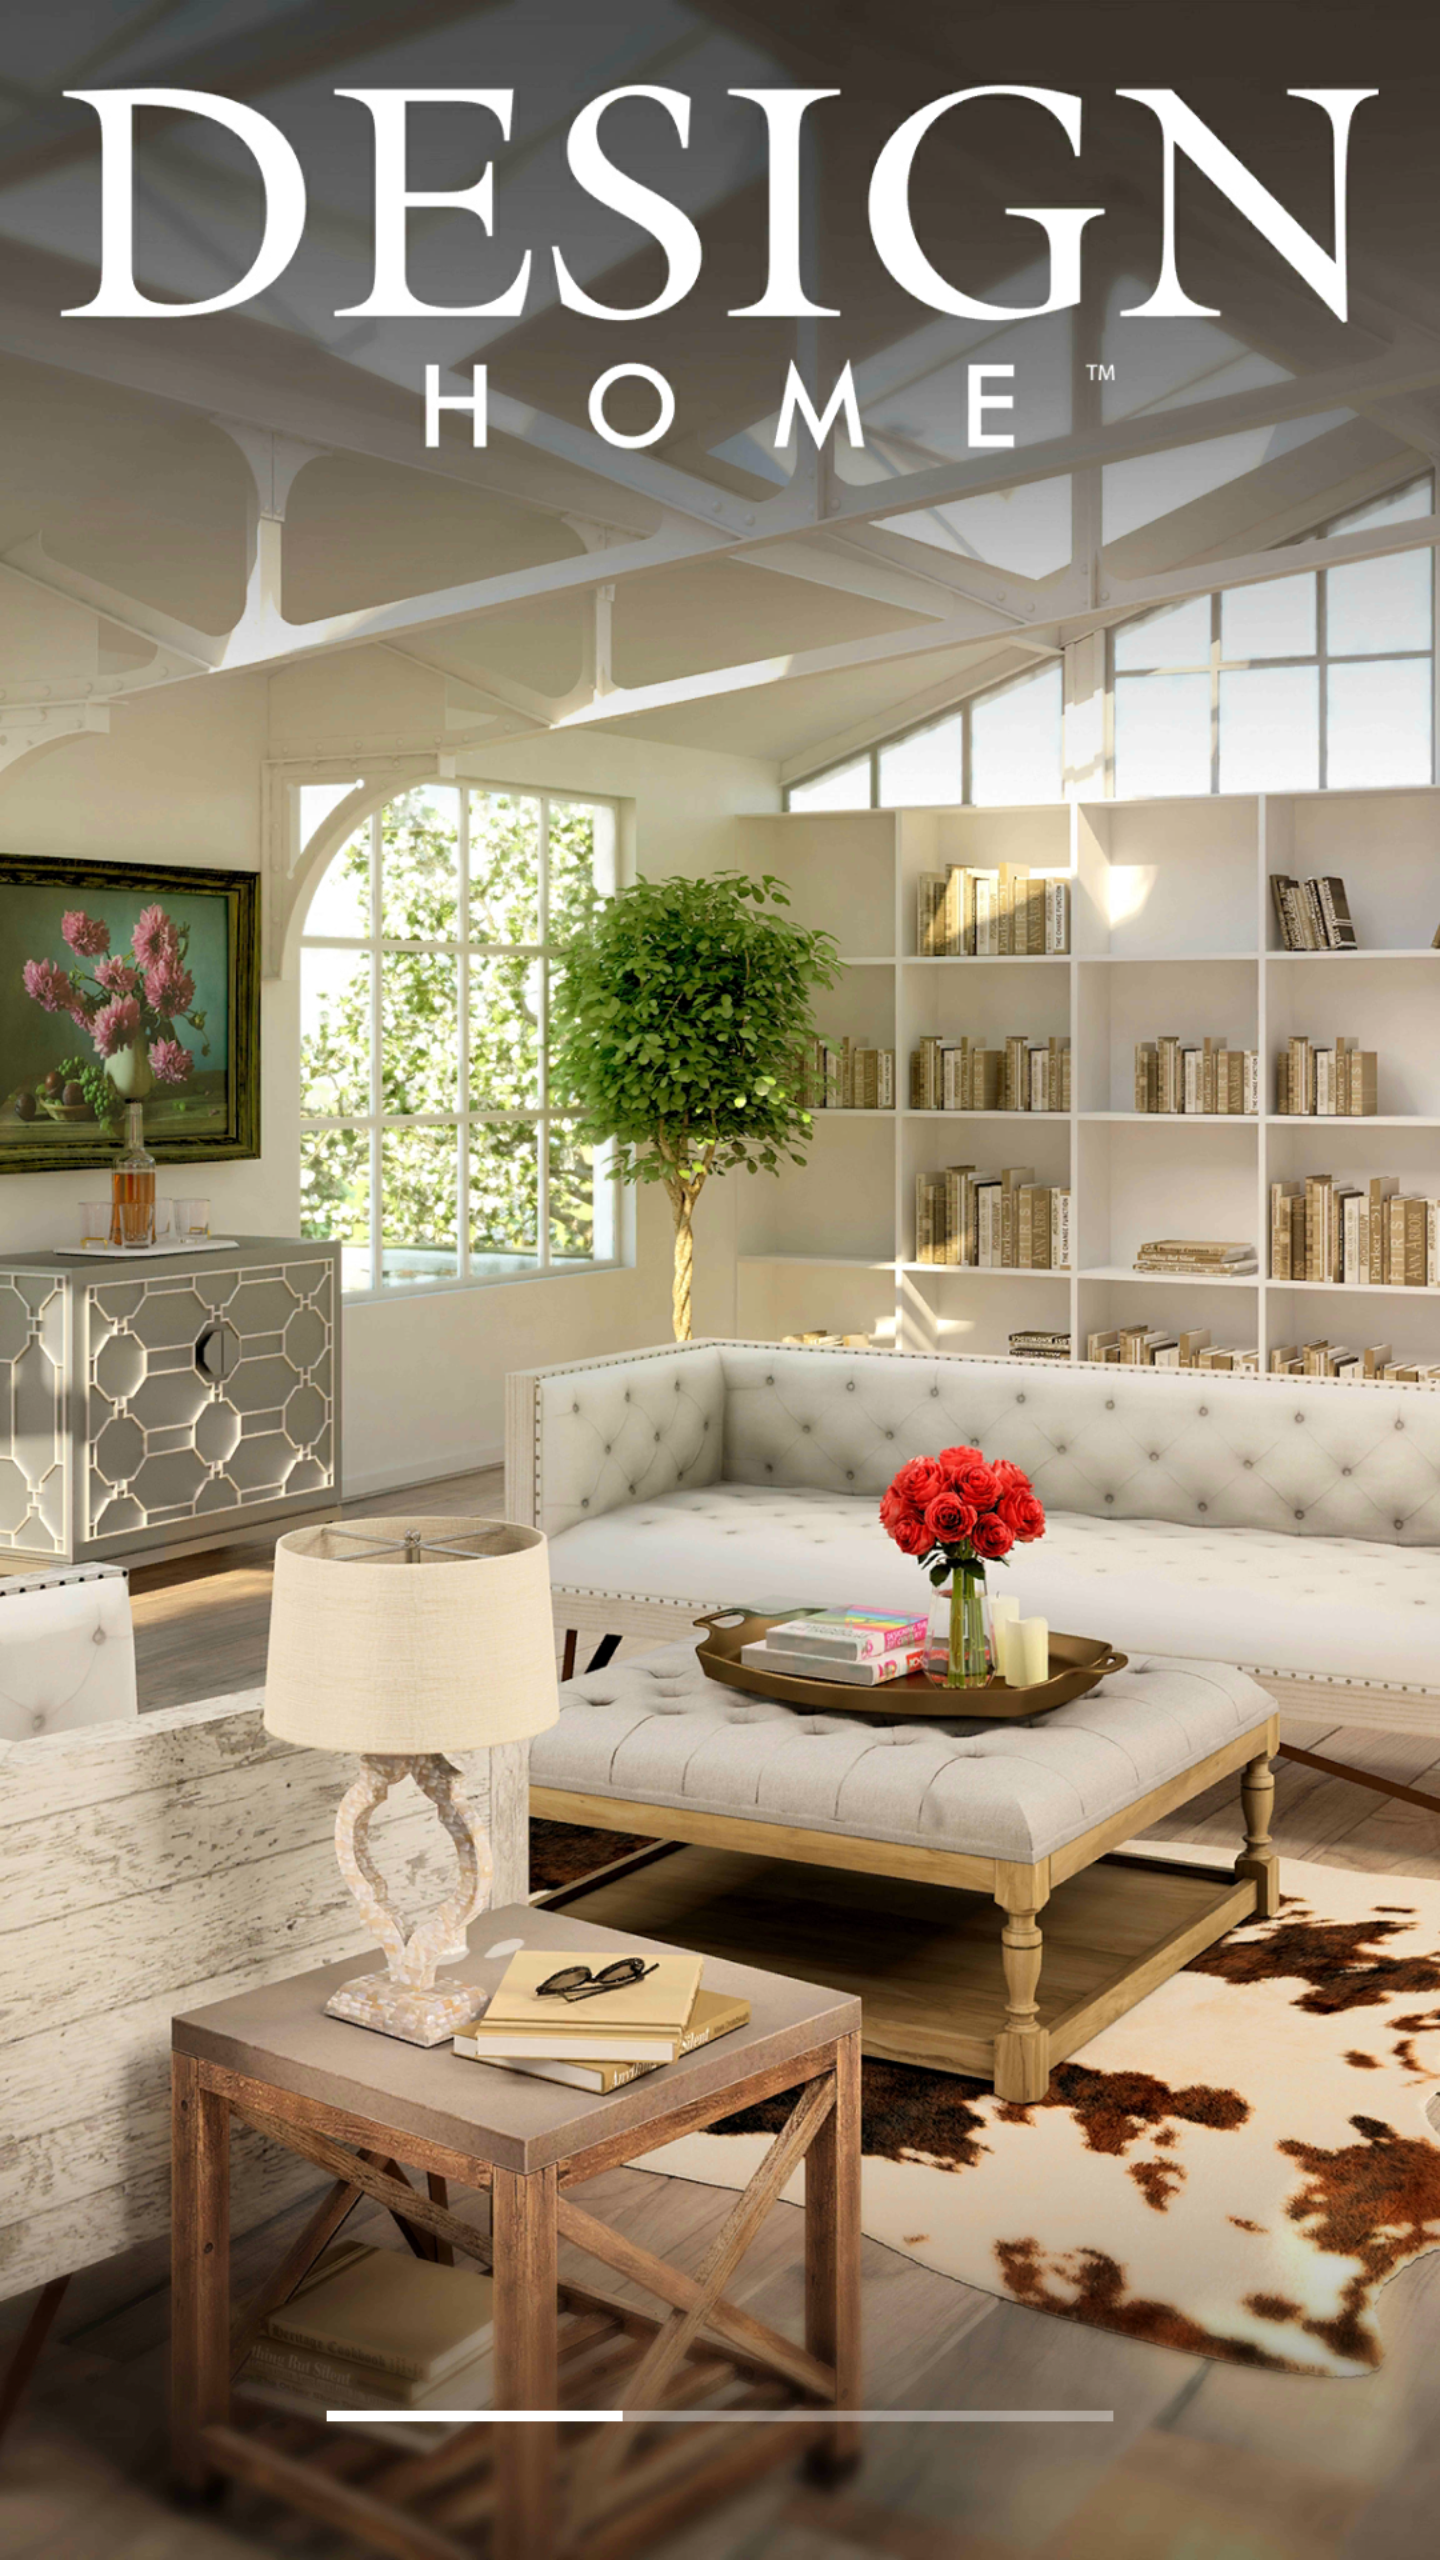 Design Home Guide Tips Tricks Online Fanatic